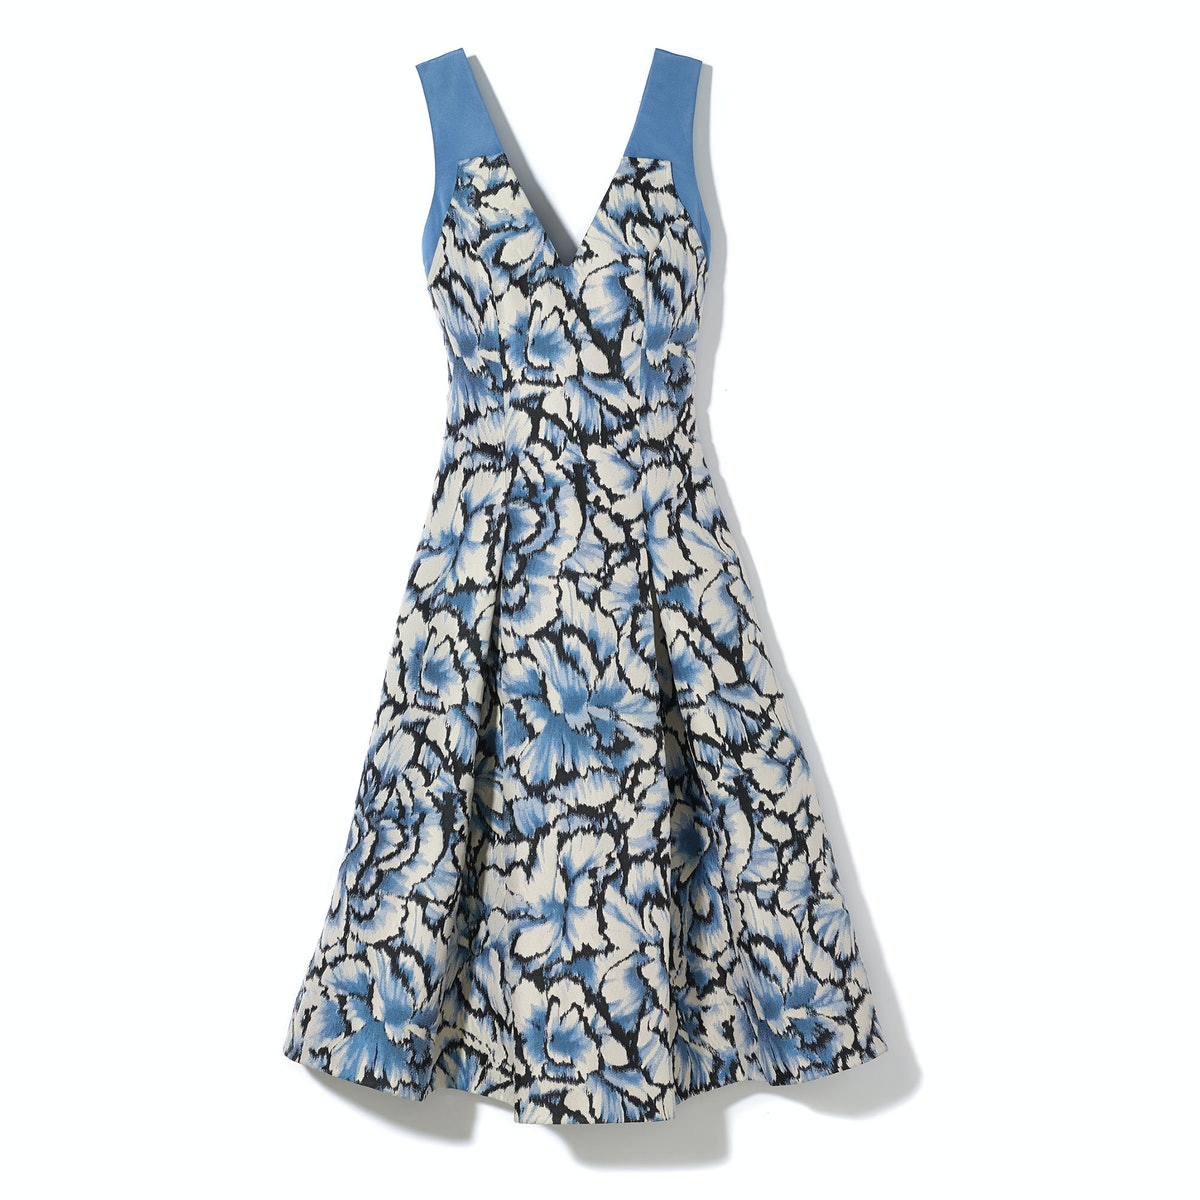 Carolina Herrera Feathered Floral jacquard dress